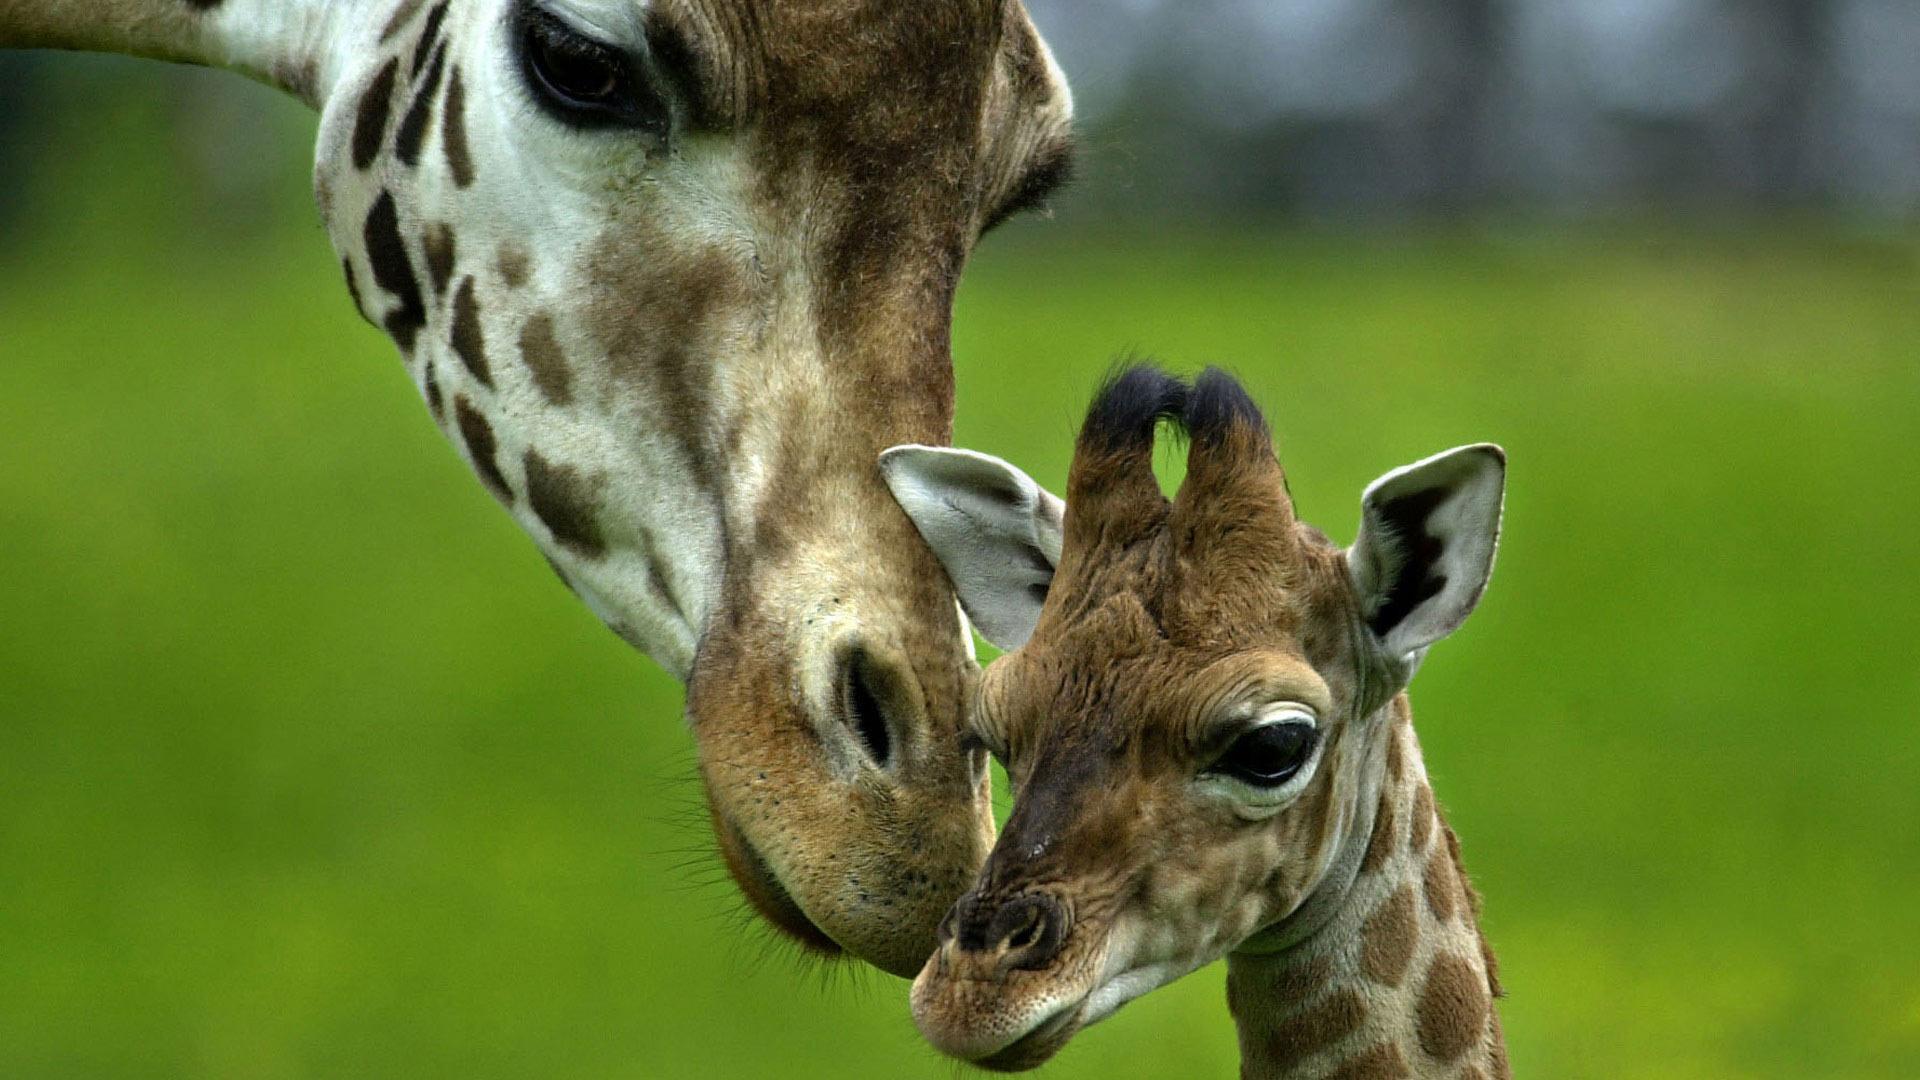 Sfondi animali hd per desktop giraffe sfondi hd gratis for Animali desktop